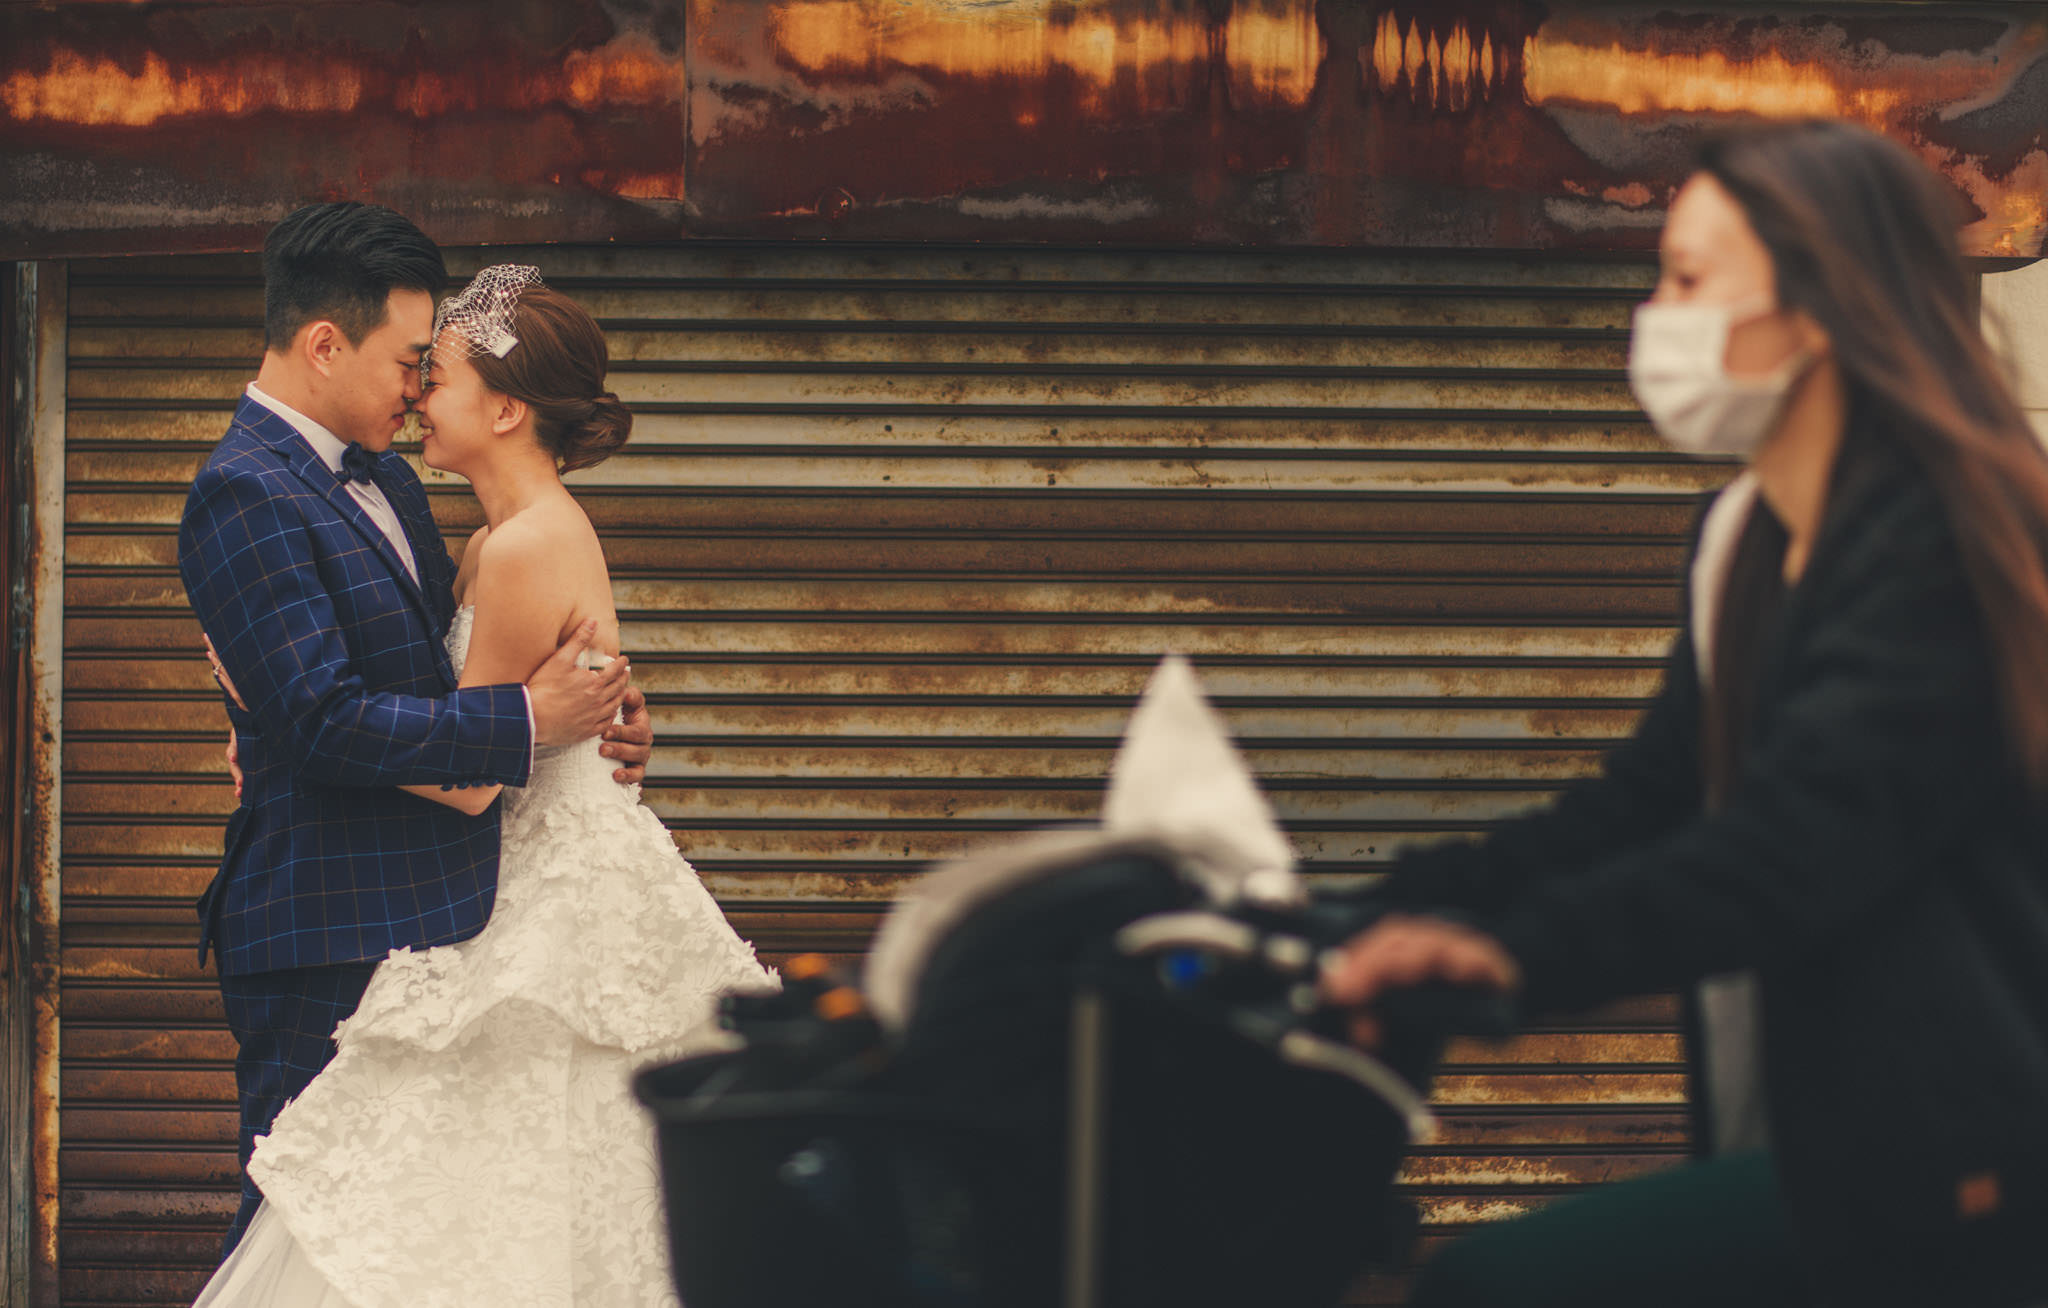 japan-wedding-photography-by-roberto-panciatici-photography-49